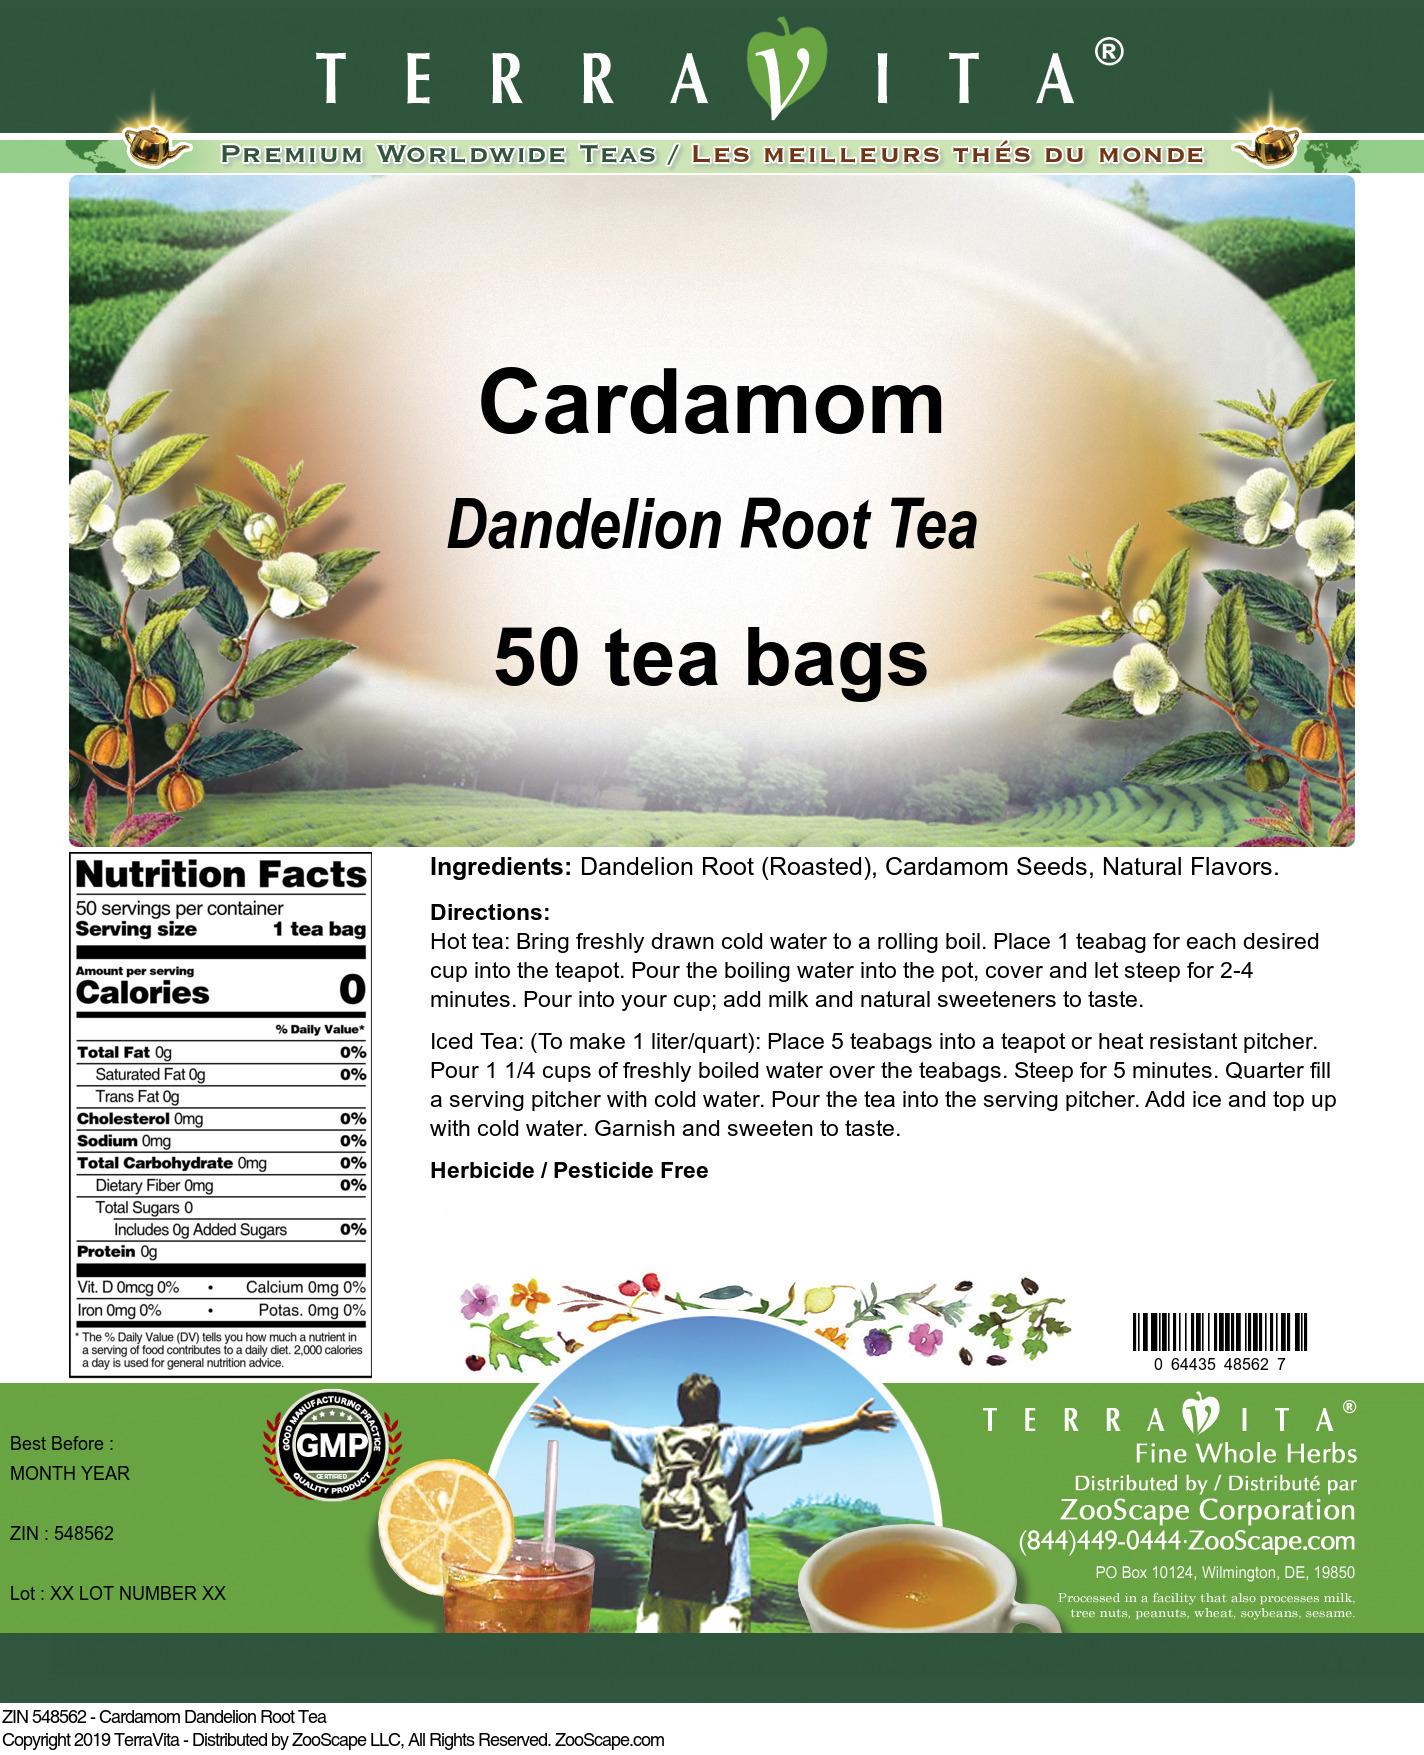 Cardamom Dandelion Root Tea